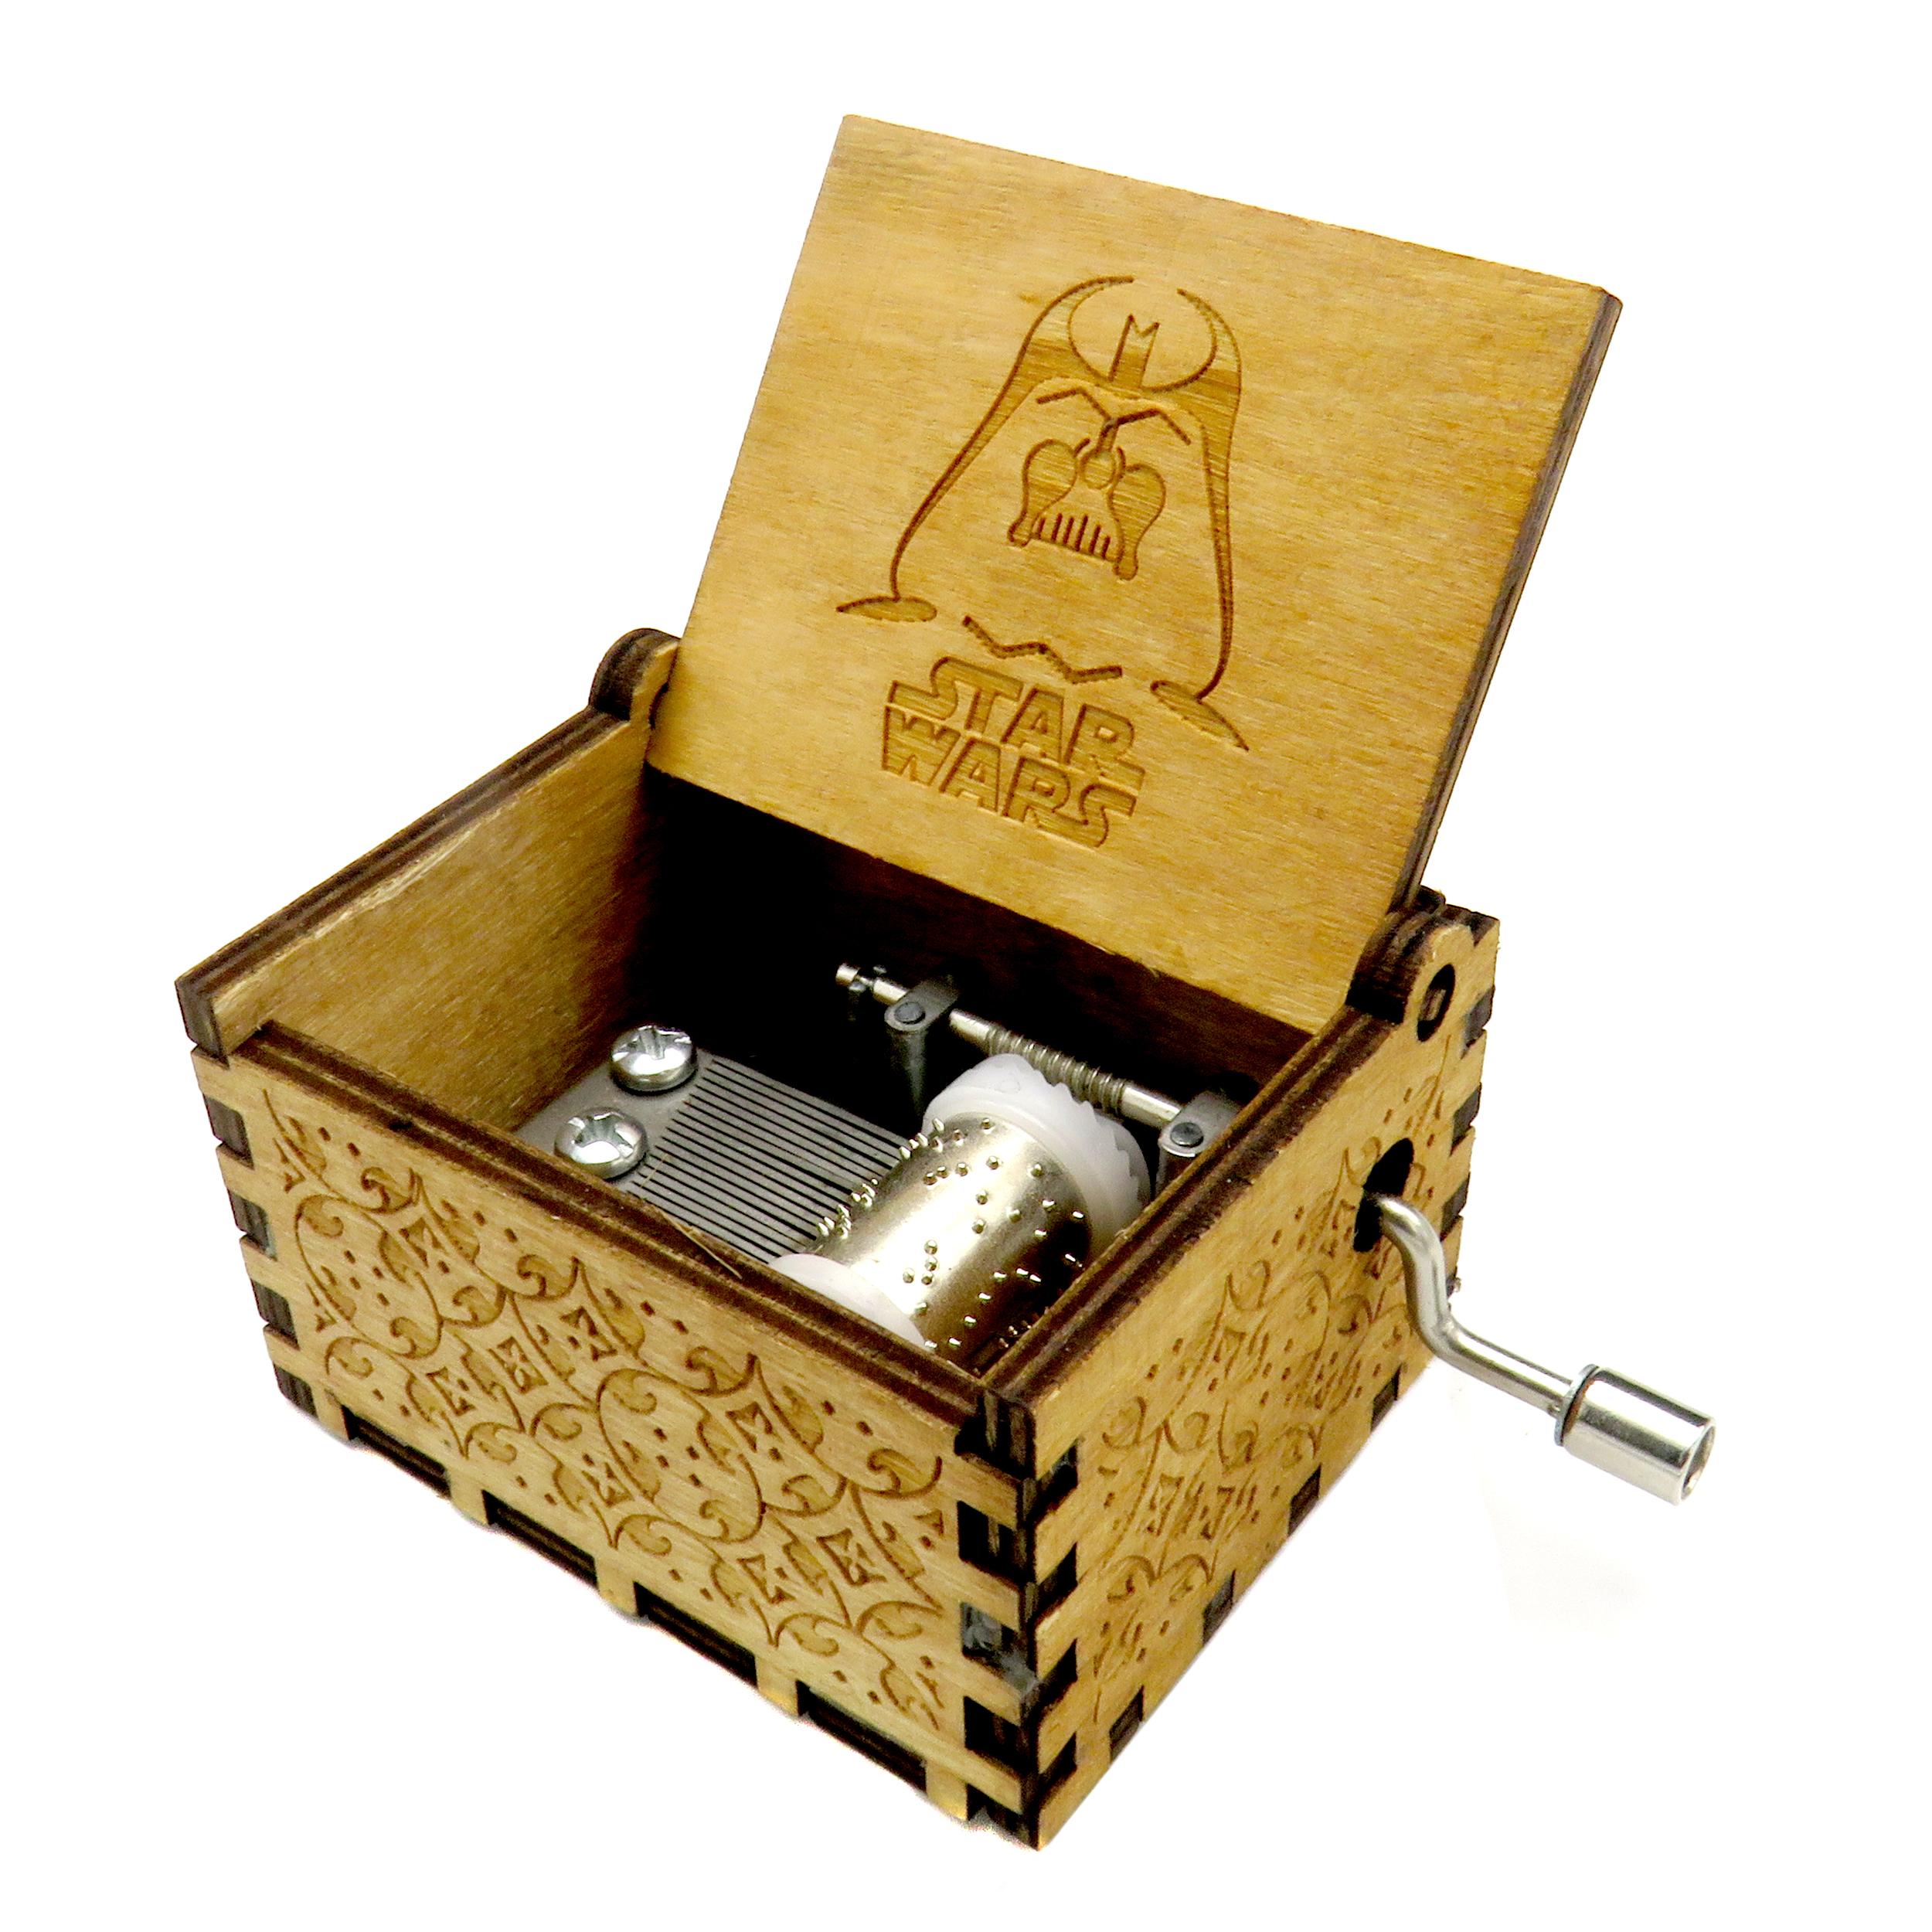 جعبه موزیکال مدل Star Wars